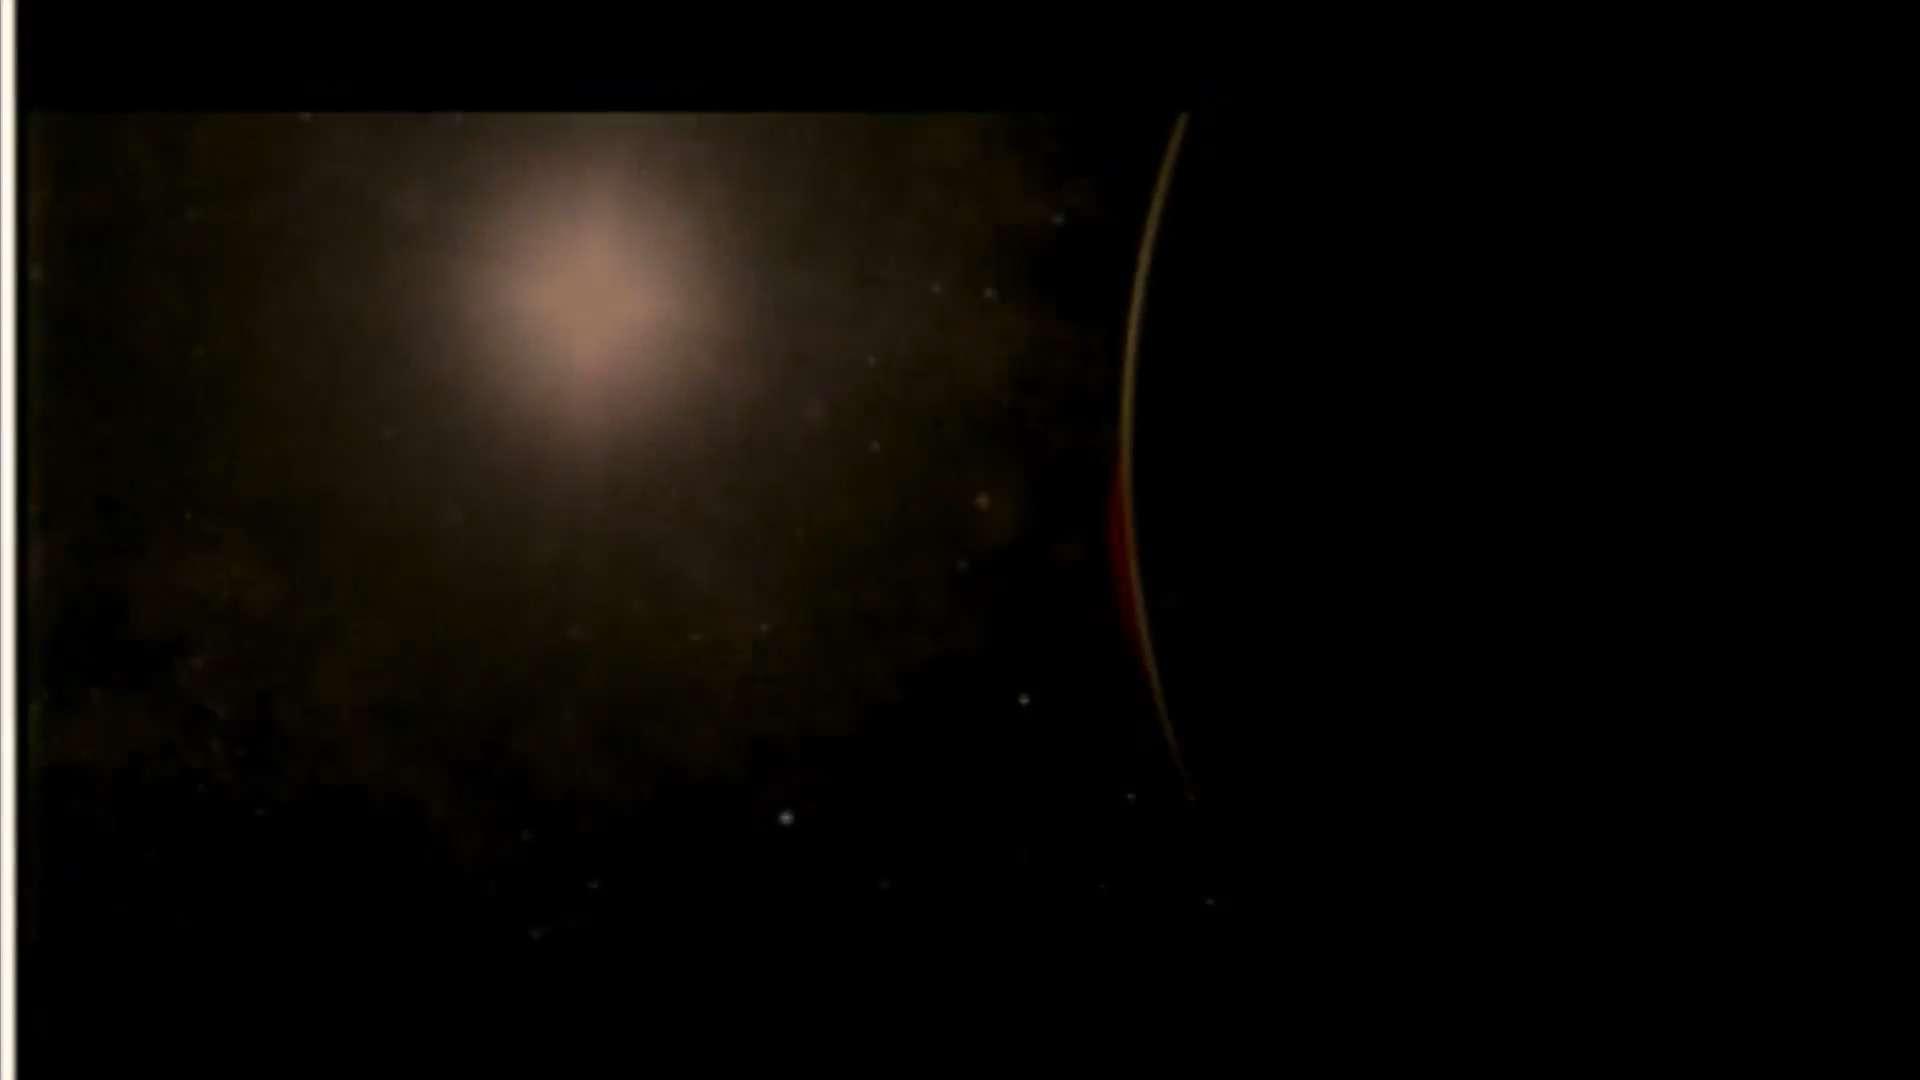 [فيلم][تورنت][تحميل][مرجان أحمد مرجان][2007][1080p][Web-DL] 2 arabp2p.com